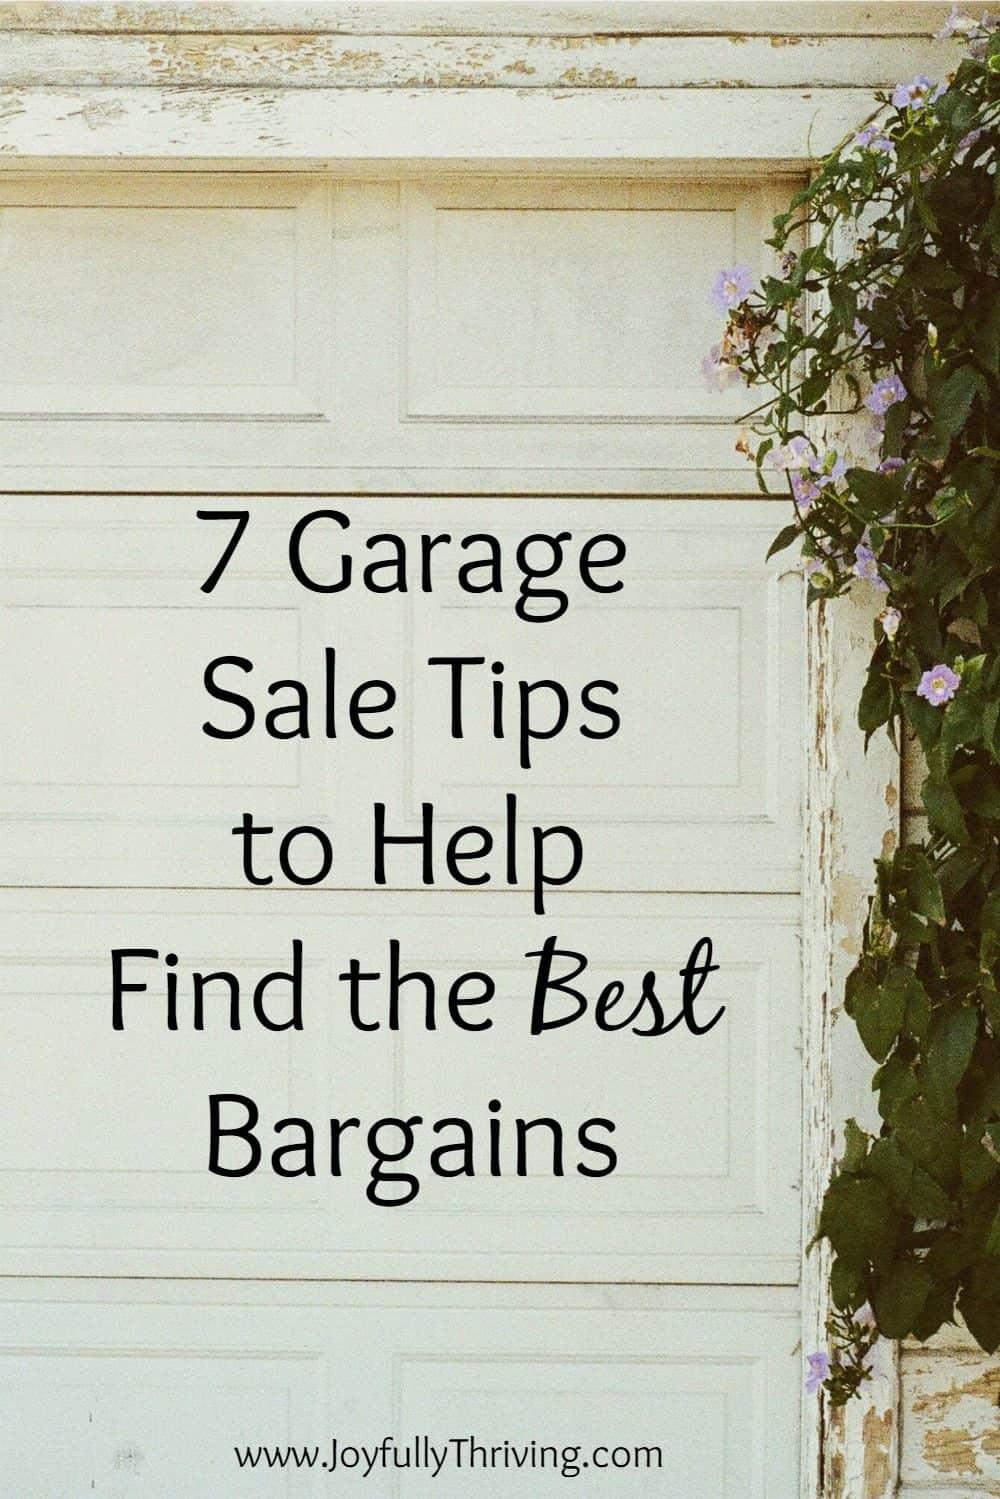 I love garage sales! Good garage sale tips here, especially number 1.